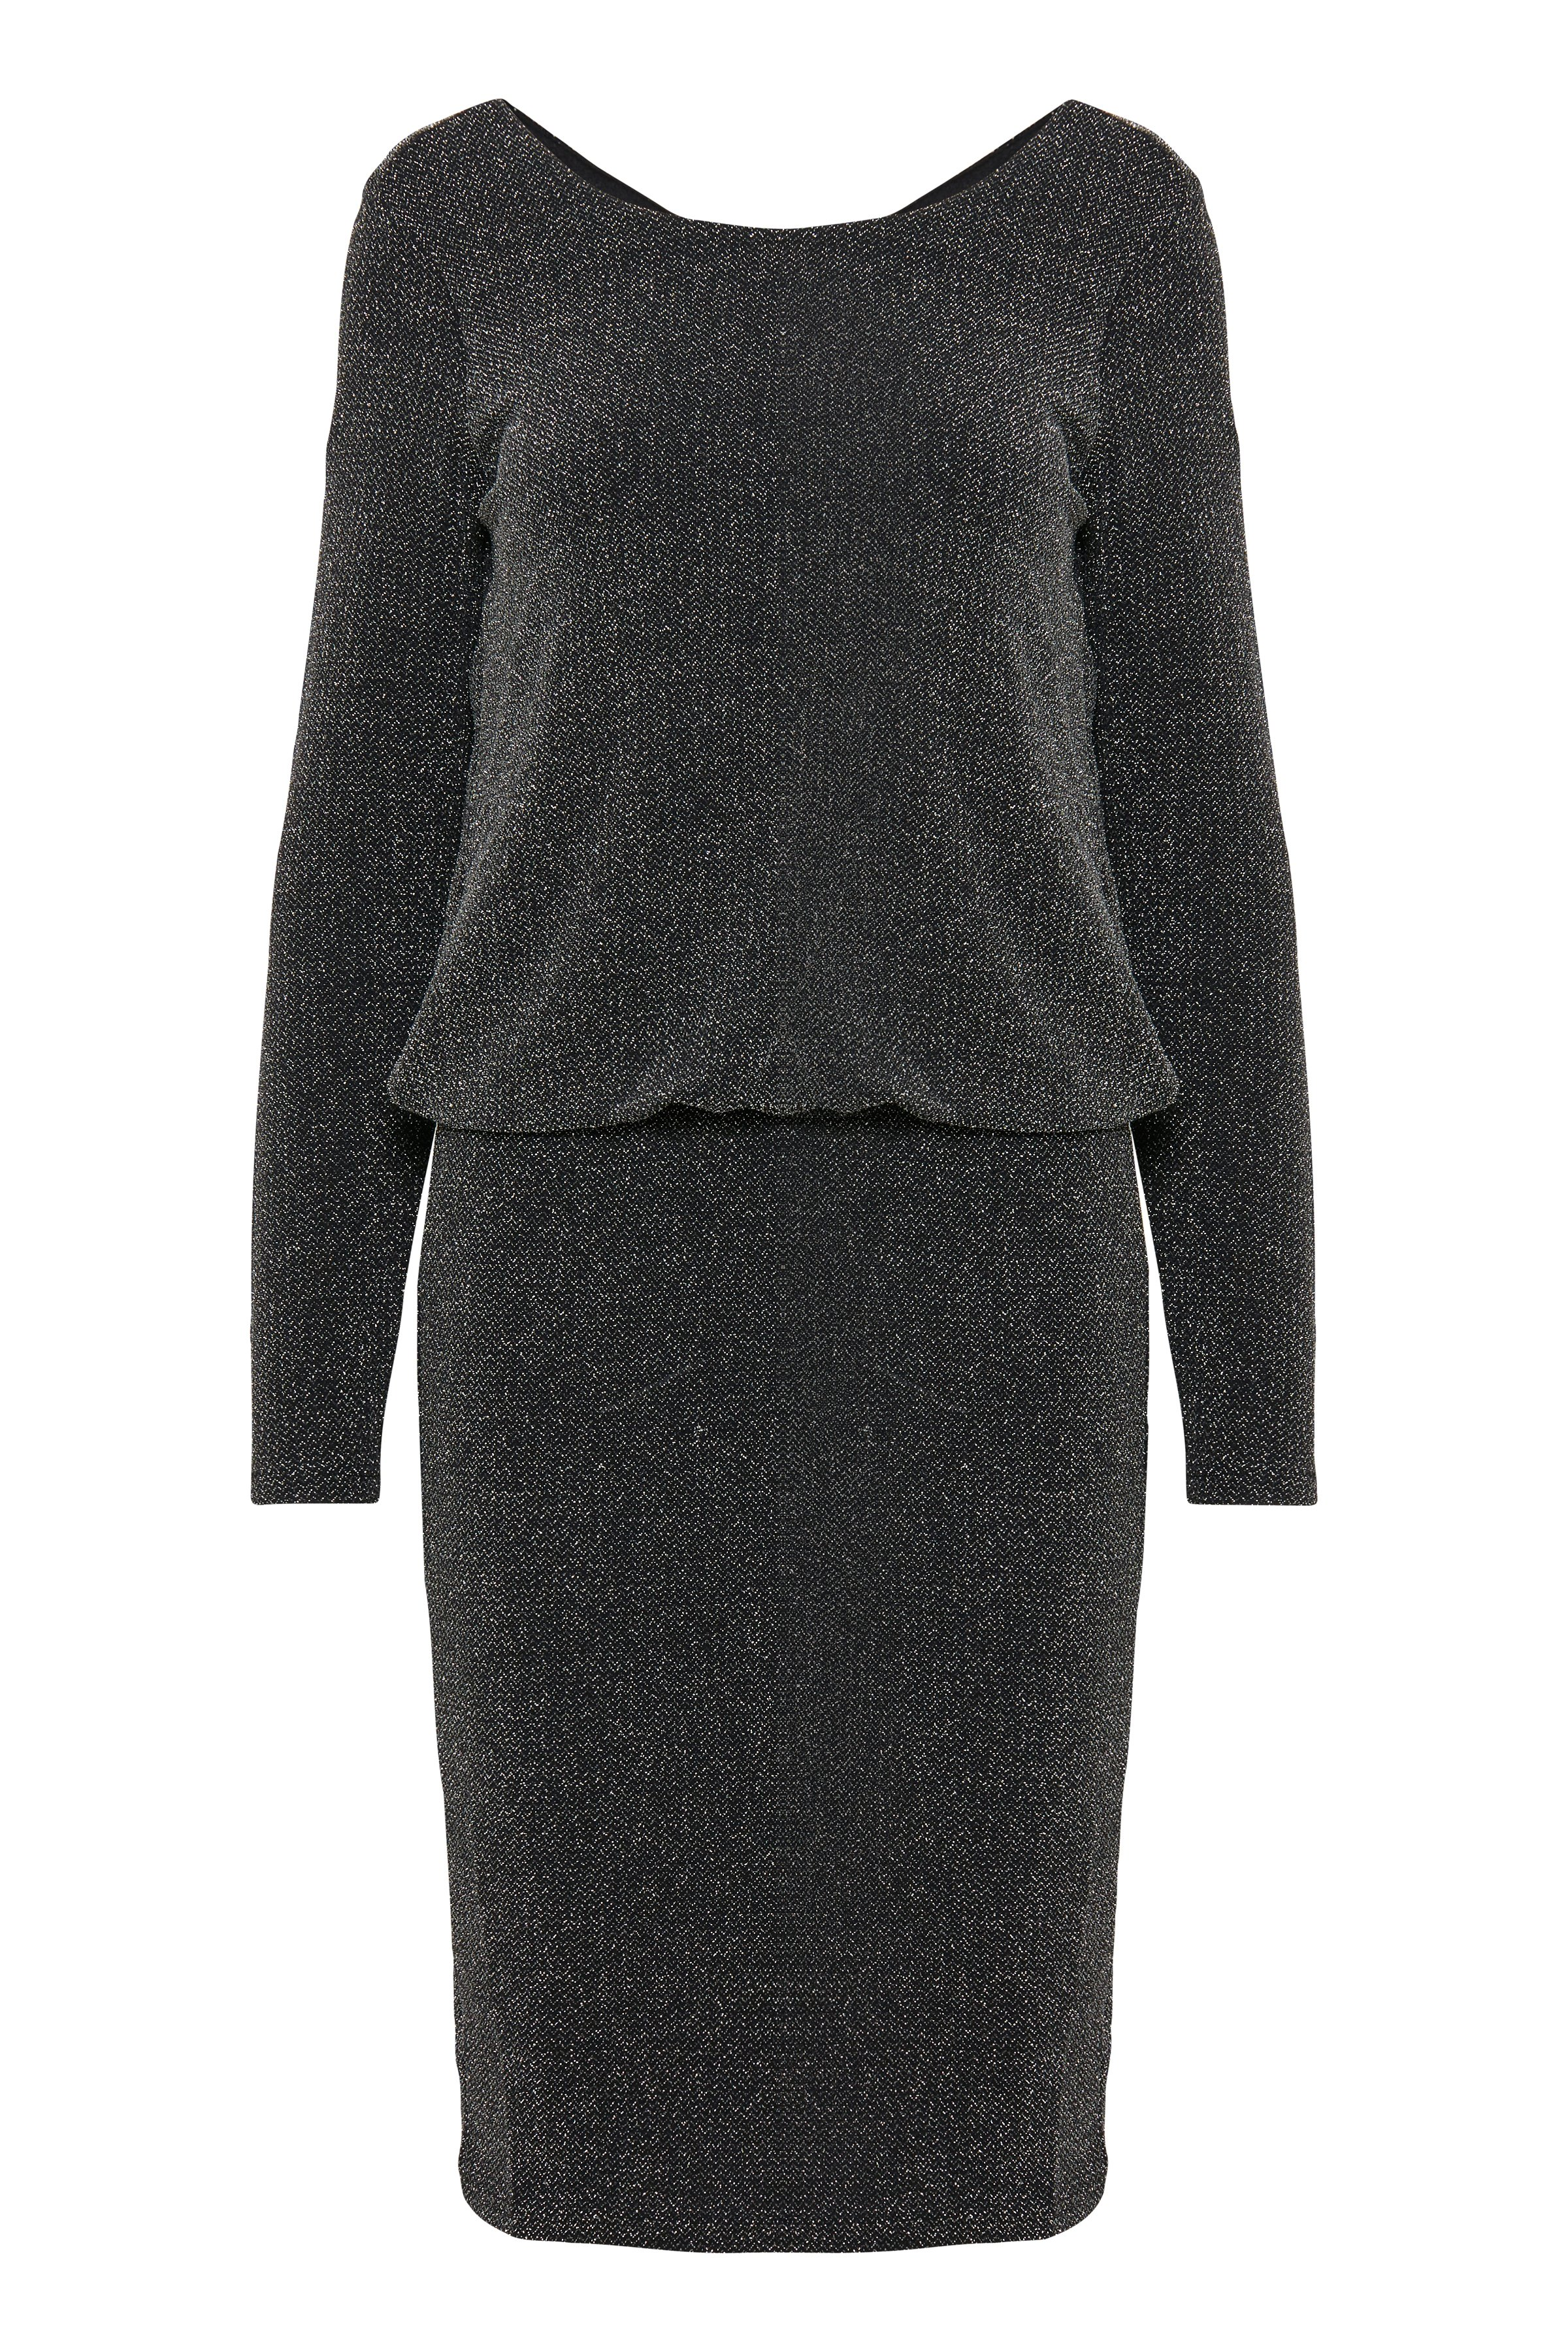 Fransa Dame Rigtig flot Liris kjole - Gråmeleret